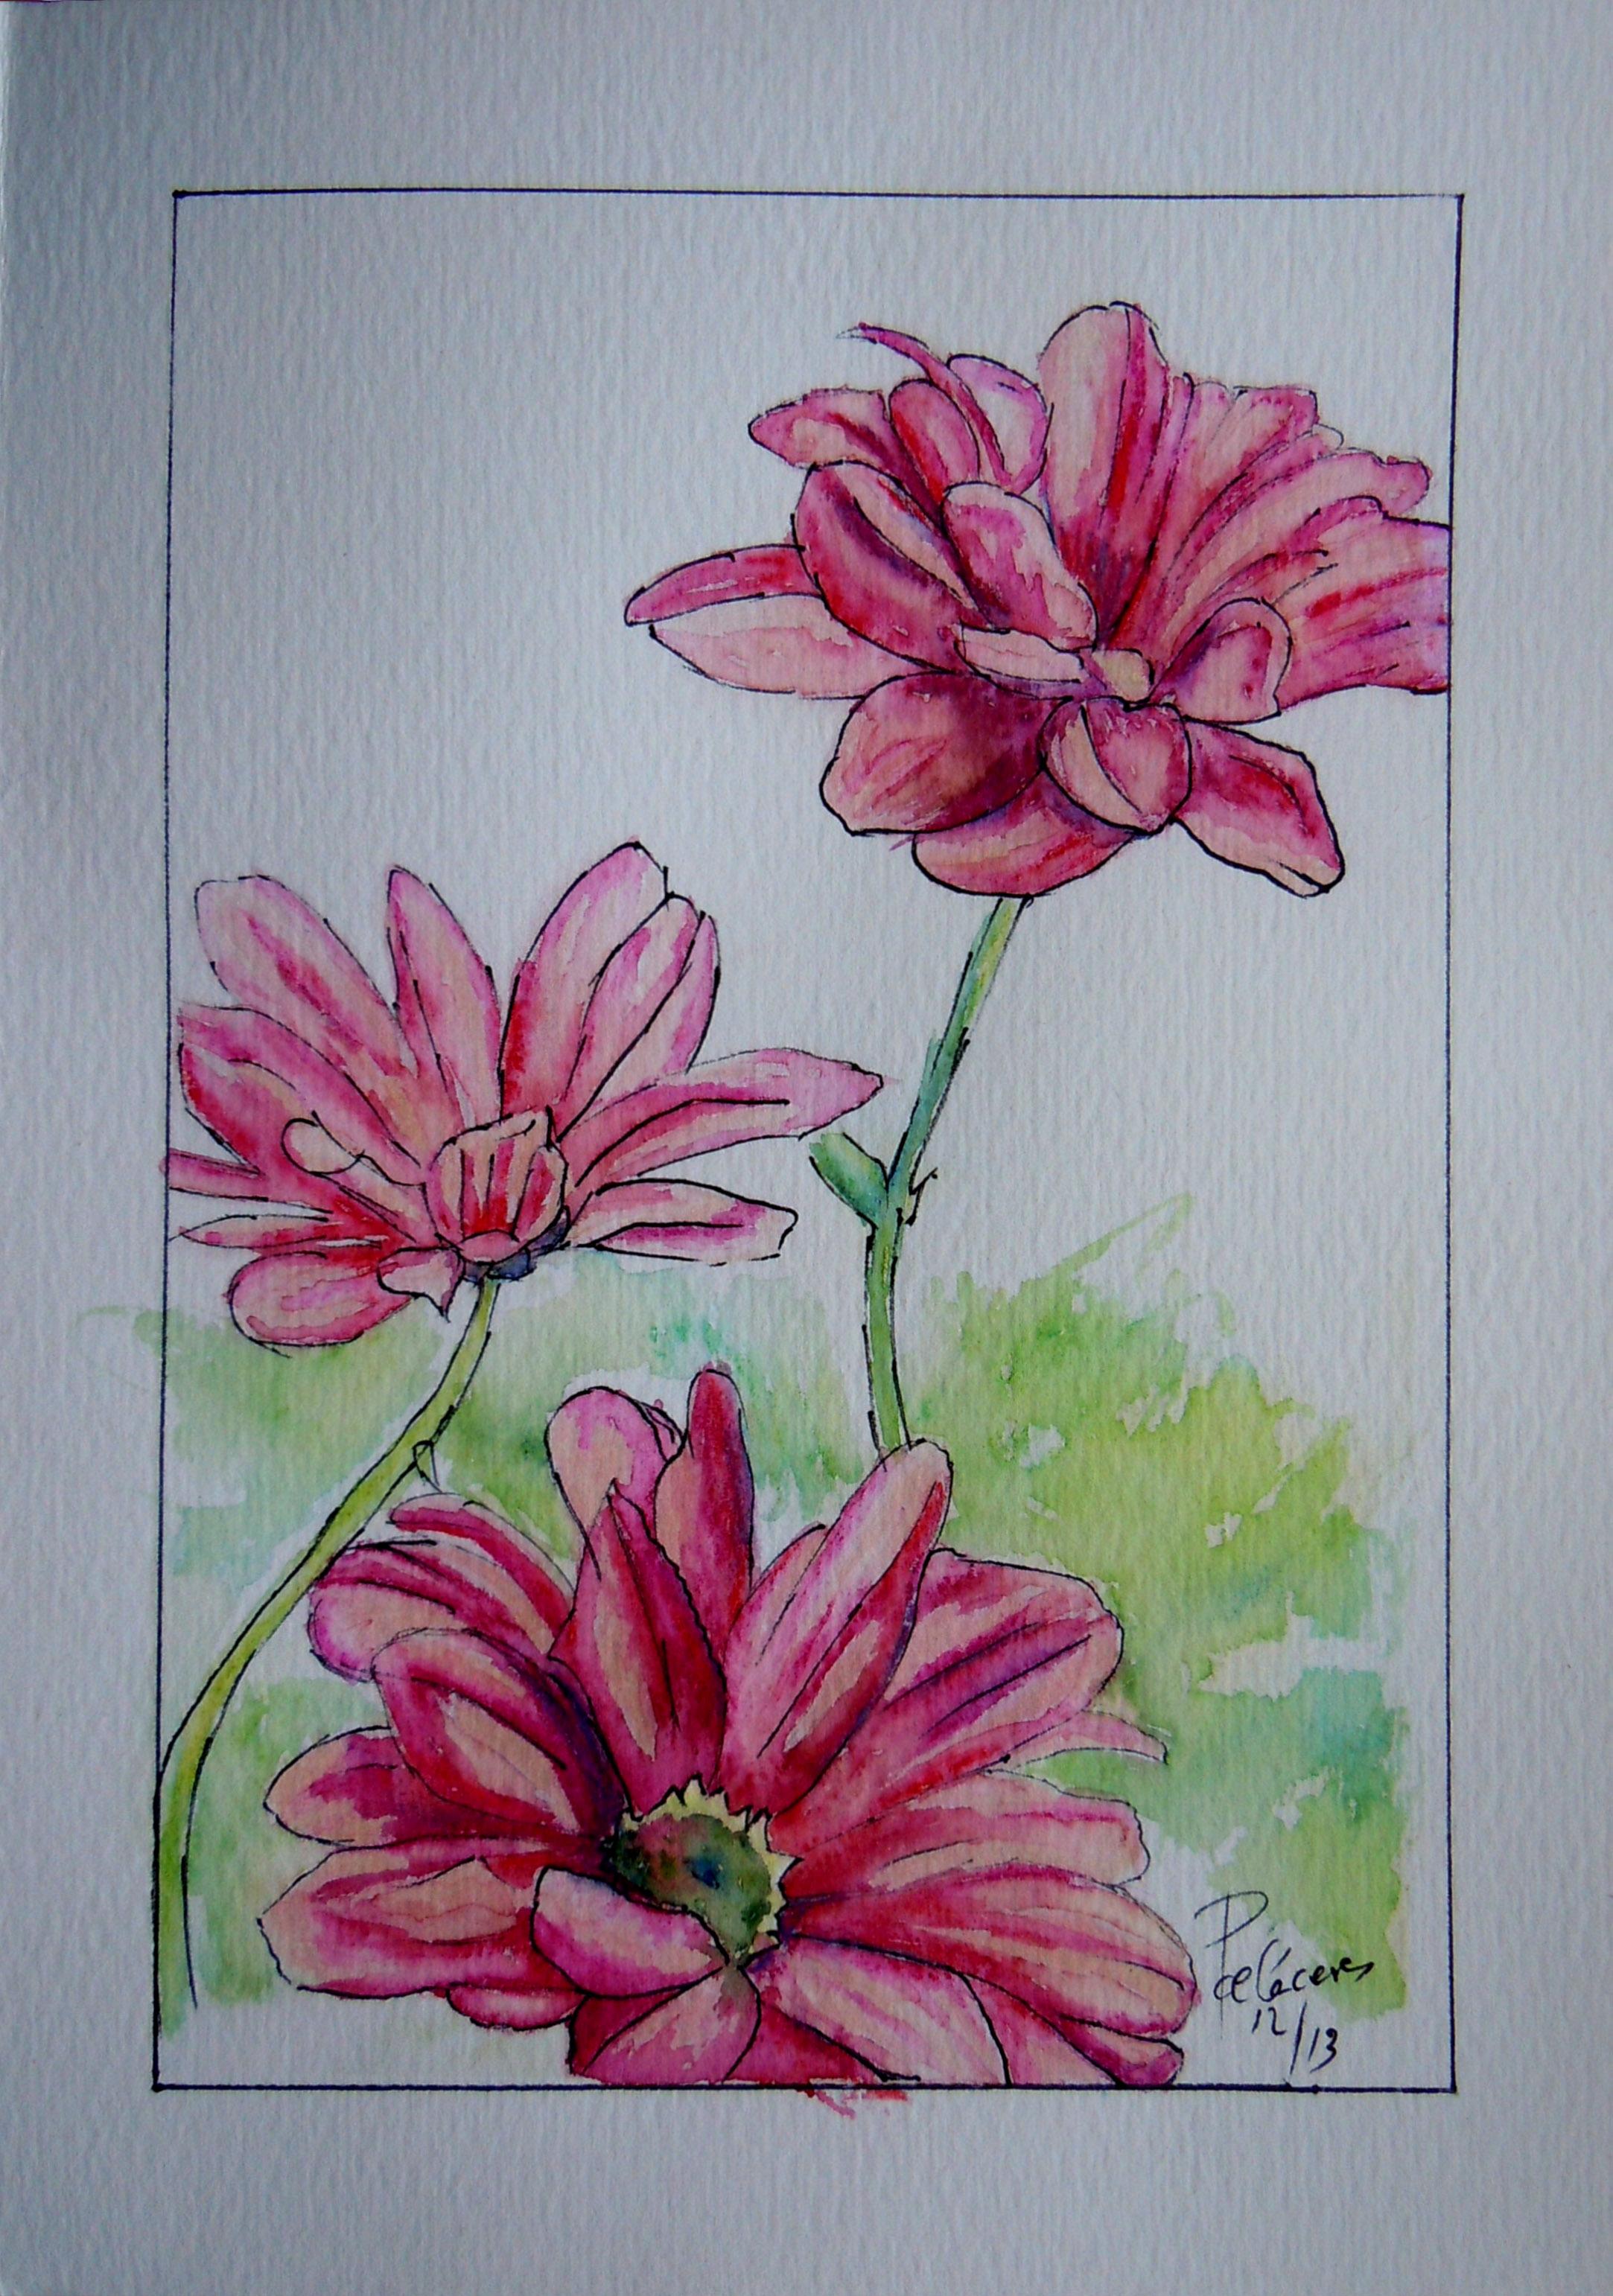 tres margaritas rosas